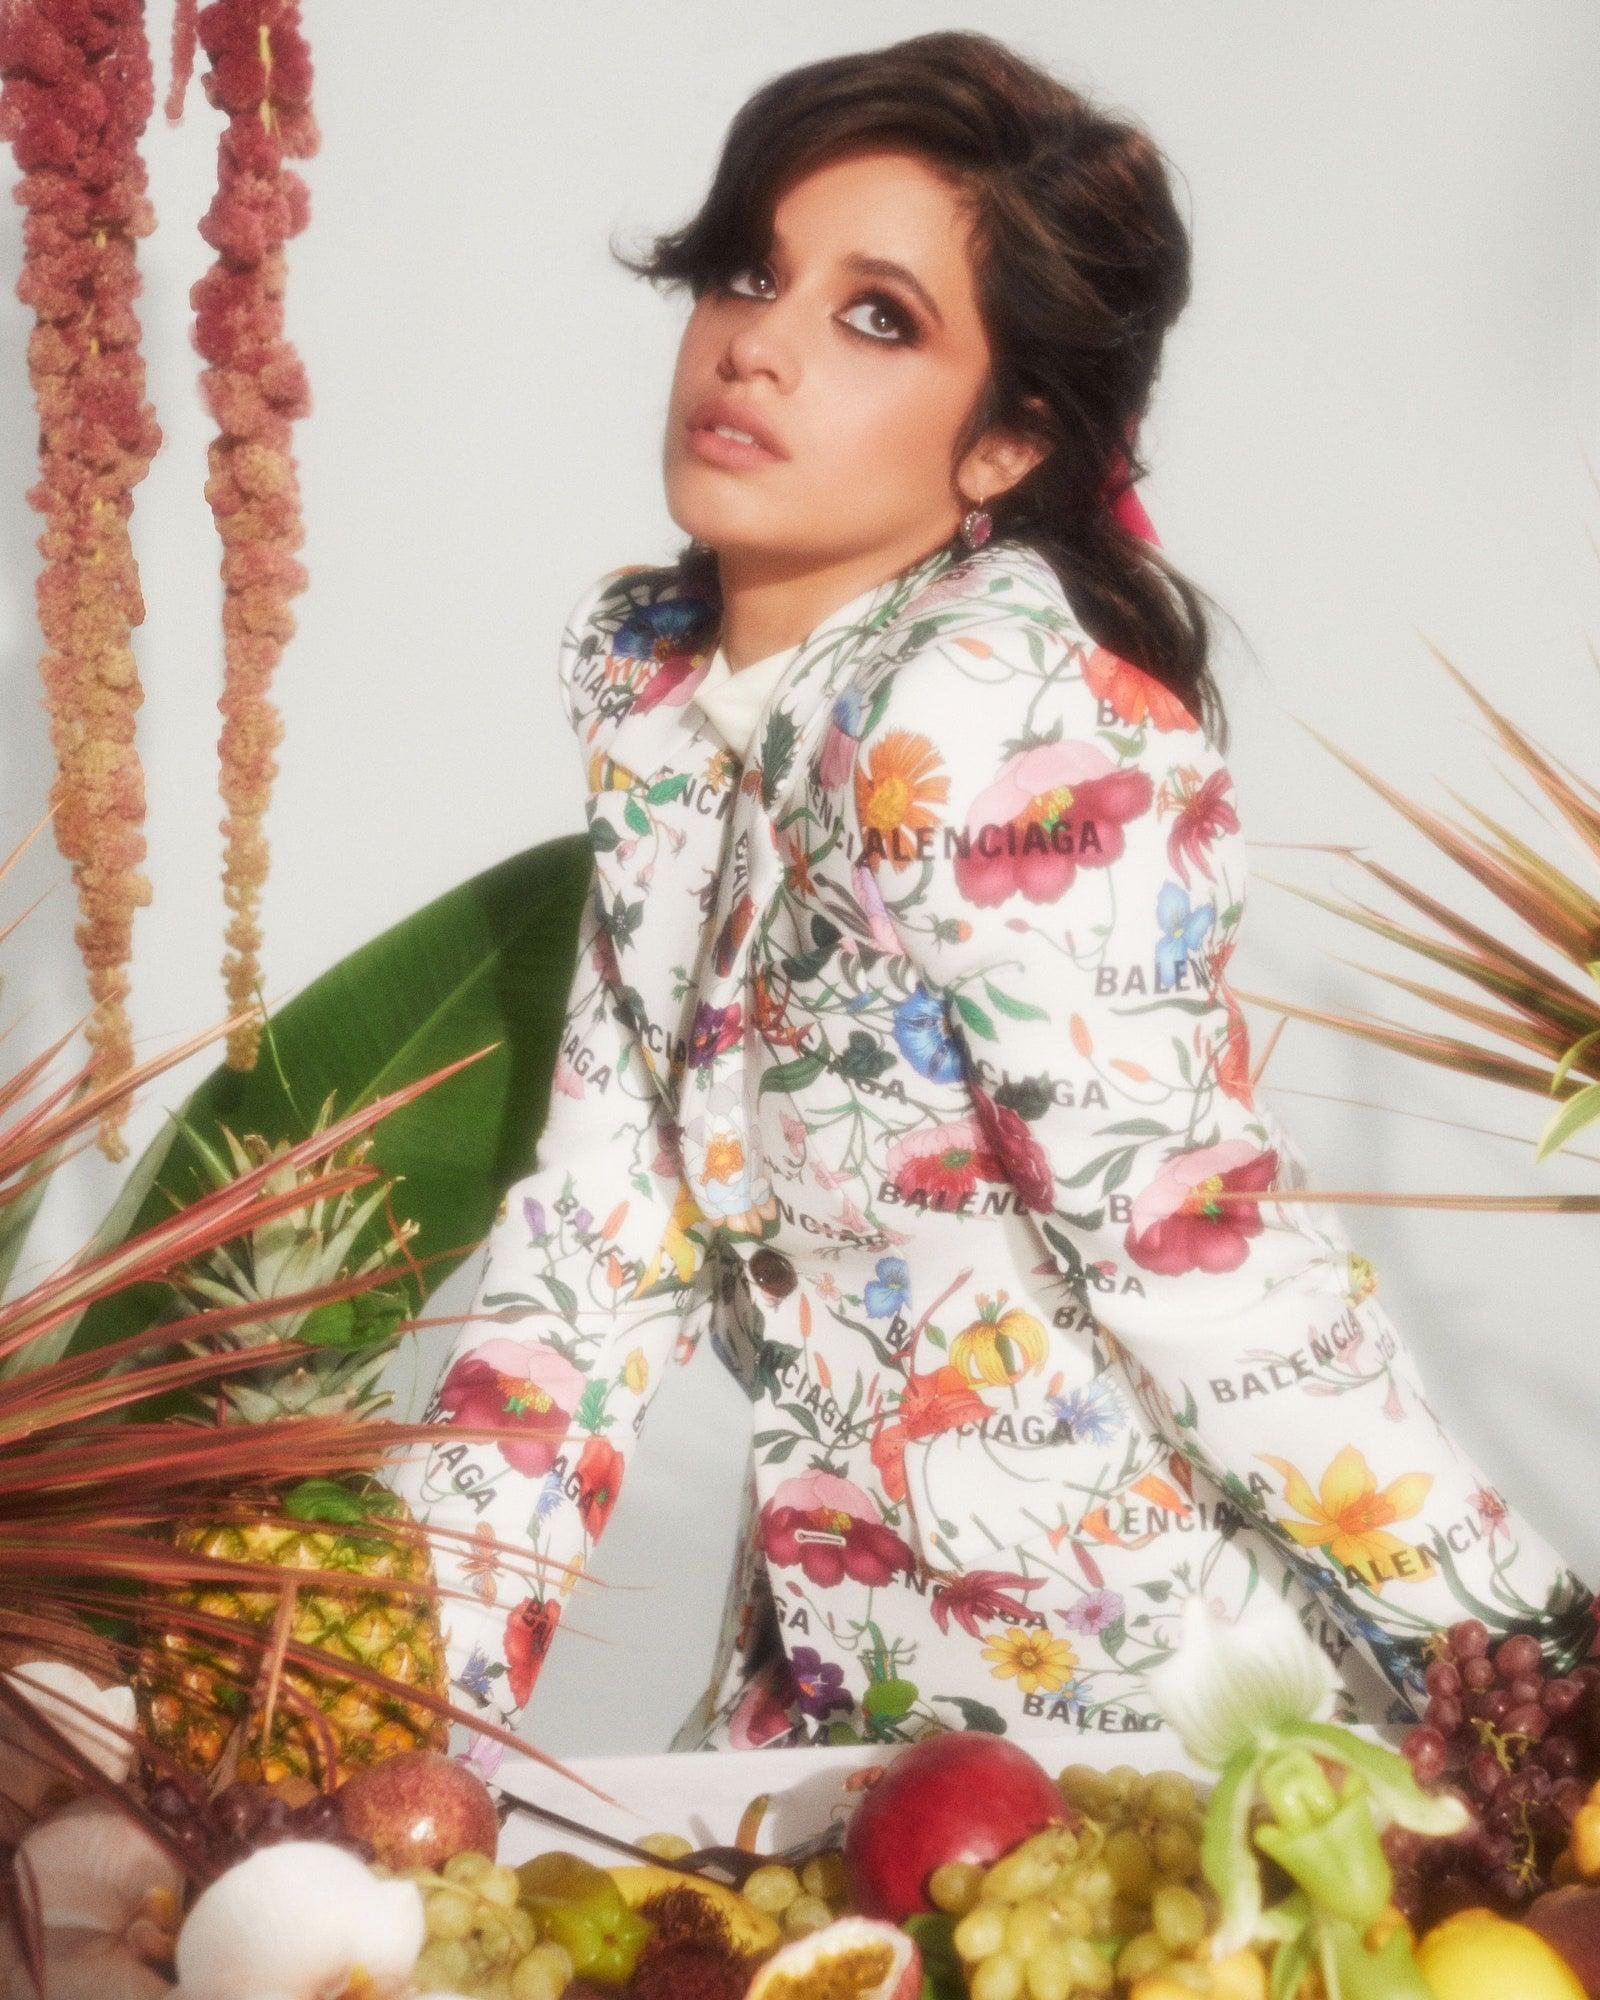 Camila Cabello Glamour 2021 15 min - Фото: Camila Cabello на обложке журнала Glamour